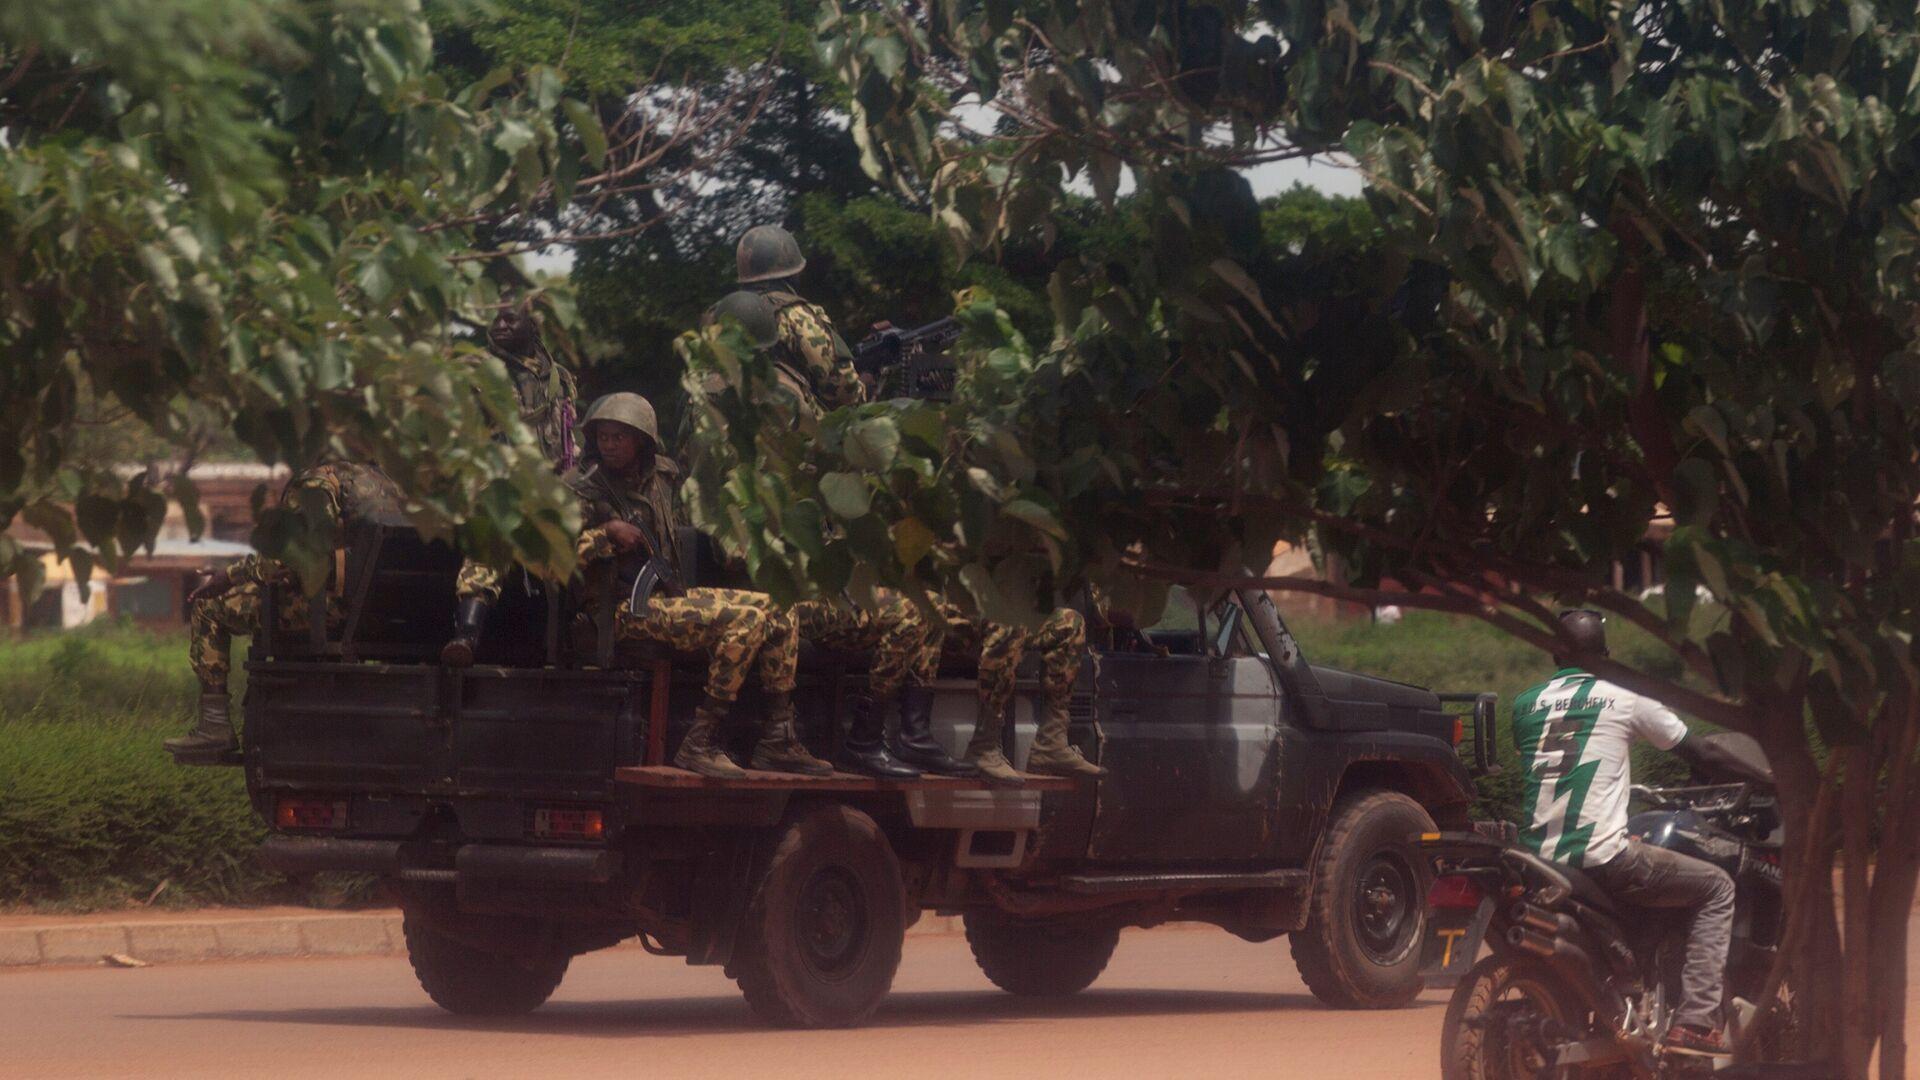 Unos militares, Burkina Faso (archivo) - Sputnik Mundo, 1920, 27.04.2021